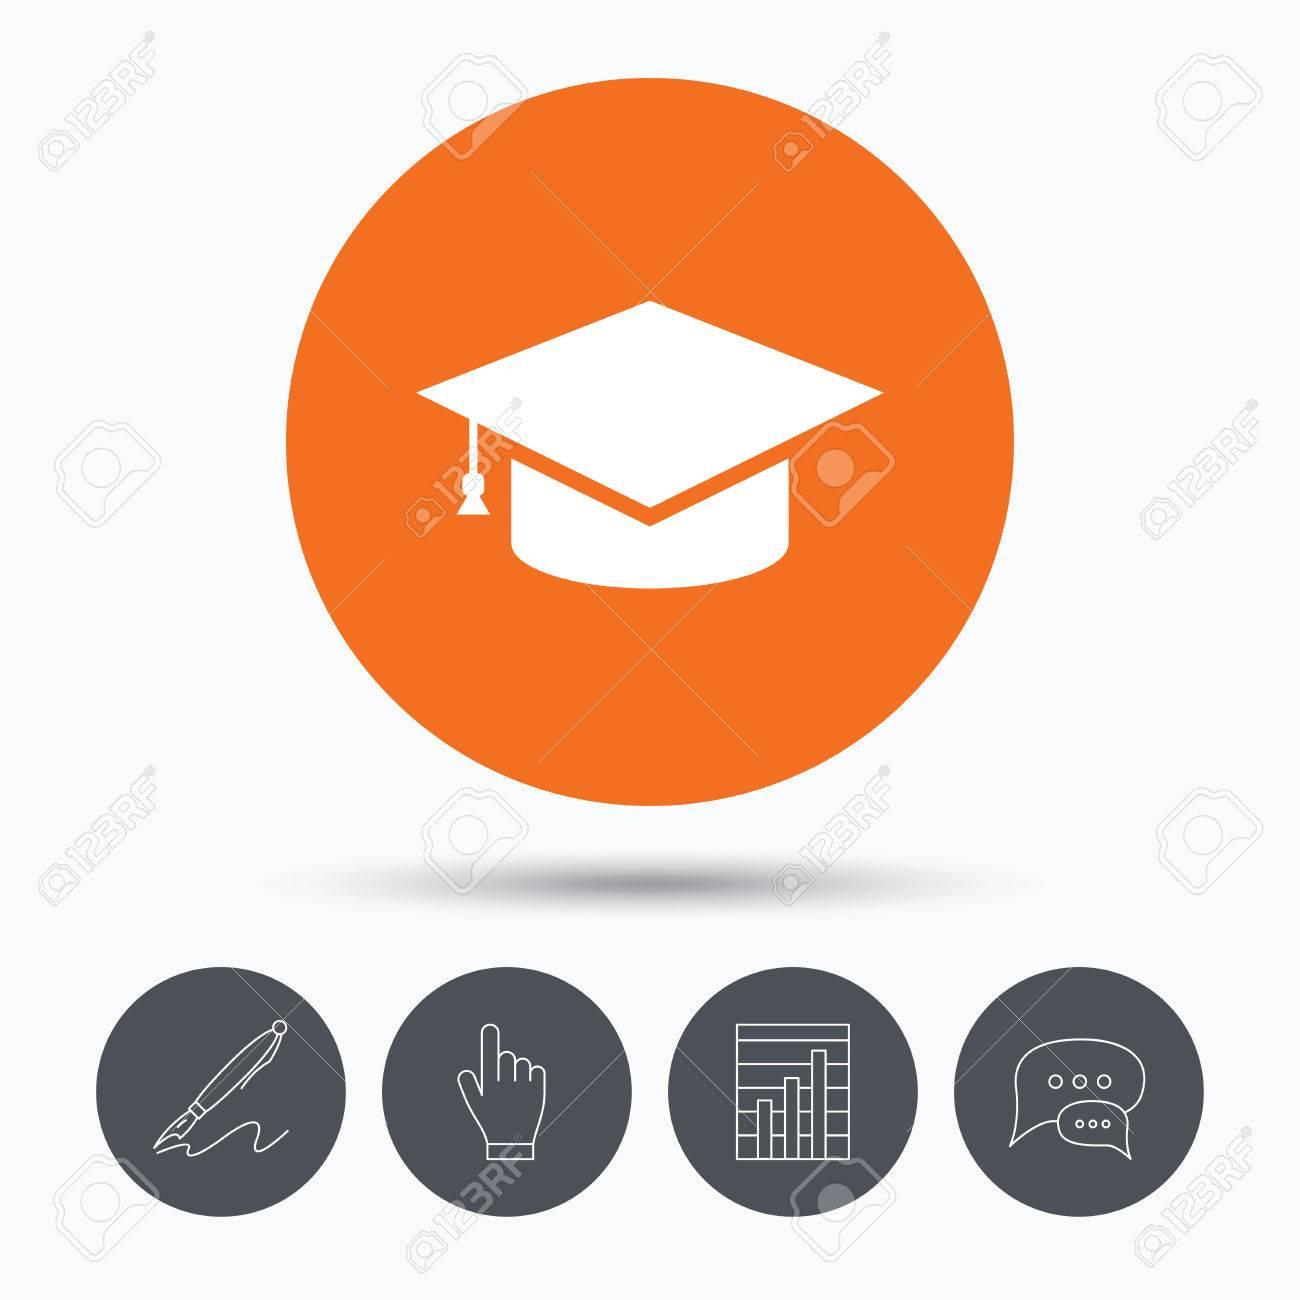 Education icon graduation cap symbol speech bubbles pen hand education icon graduation cap symbol speech bubbles pen hand click and chart biocorpaavc Choice Image